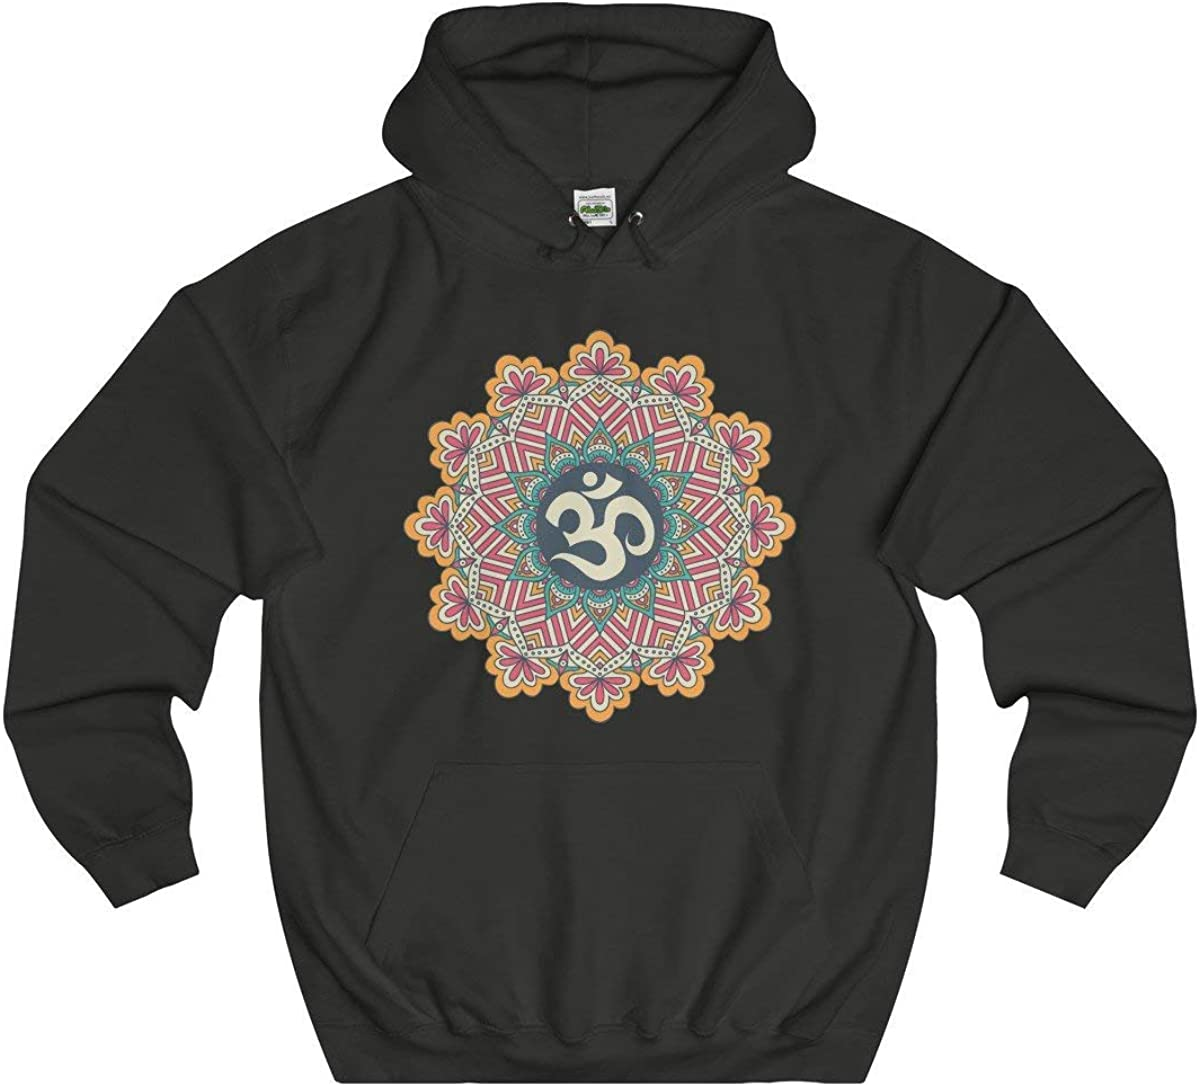 Max 47% OFF Davatka Sri Om Mandala Hoodie Yoga Sign Finally popular brand Ohm Meditation Buddhist